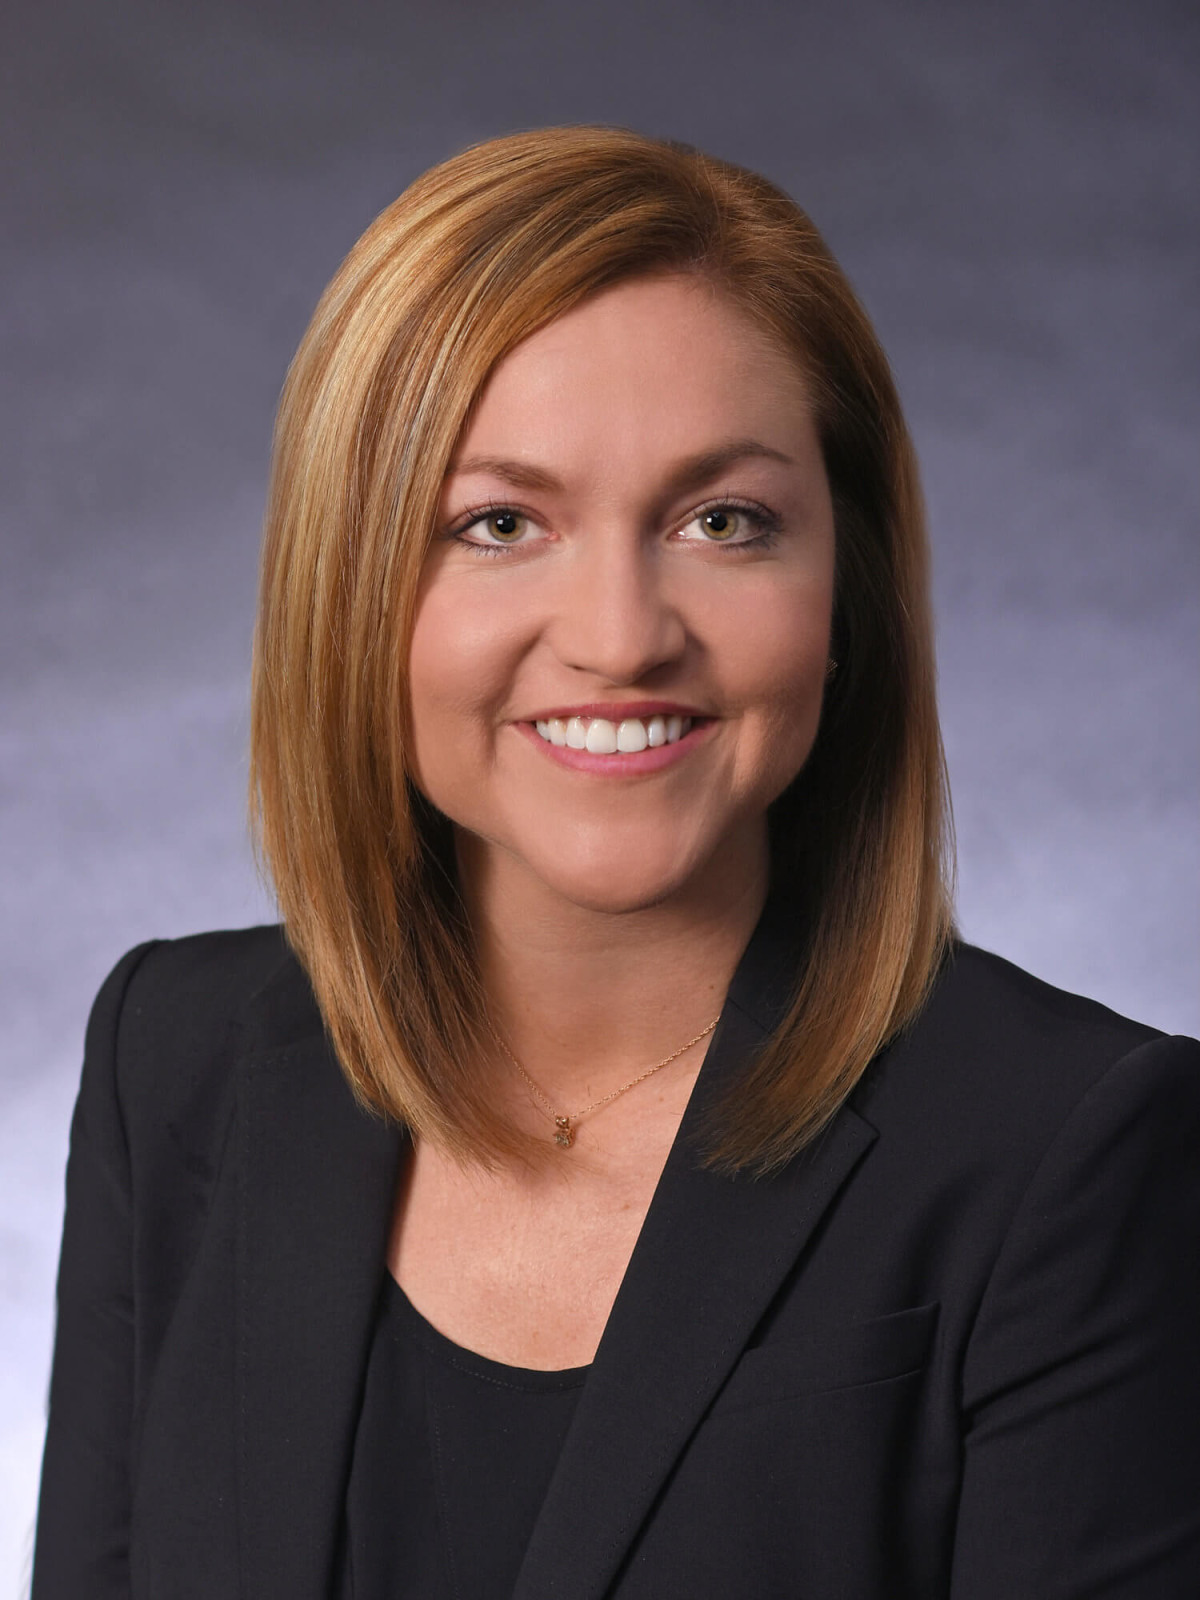 Jenna Saucedo-Herrera of San Antonio Economic Development Foundation